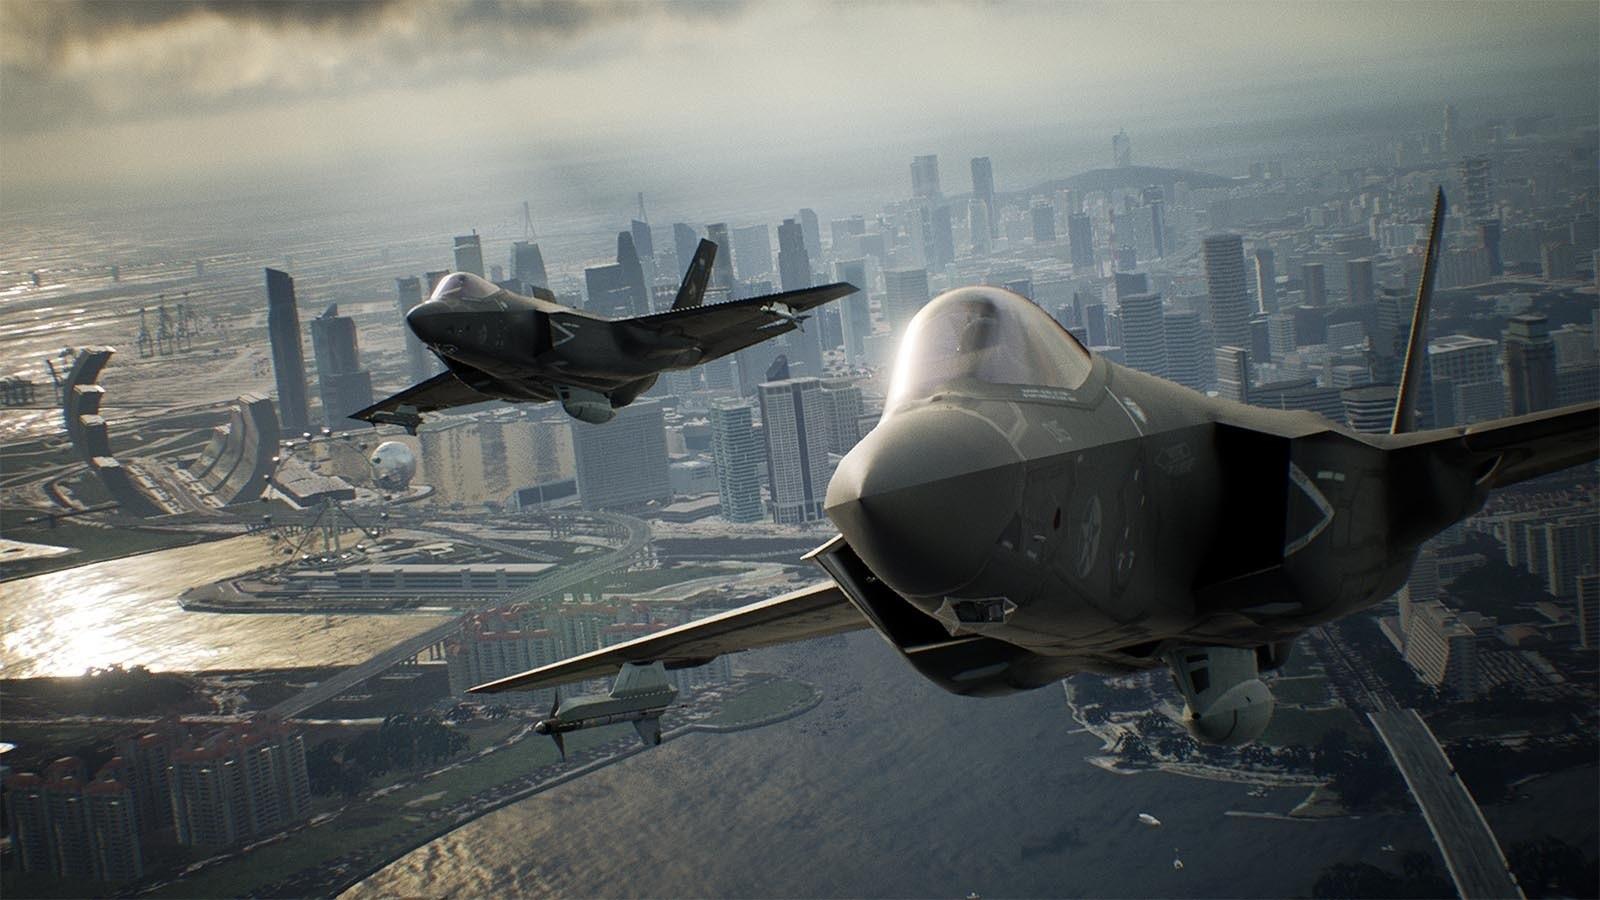 Ace Combat 7: Skies Unknown; screenshot: F-22A Raptor